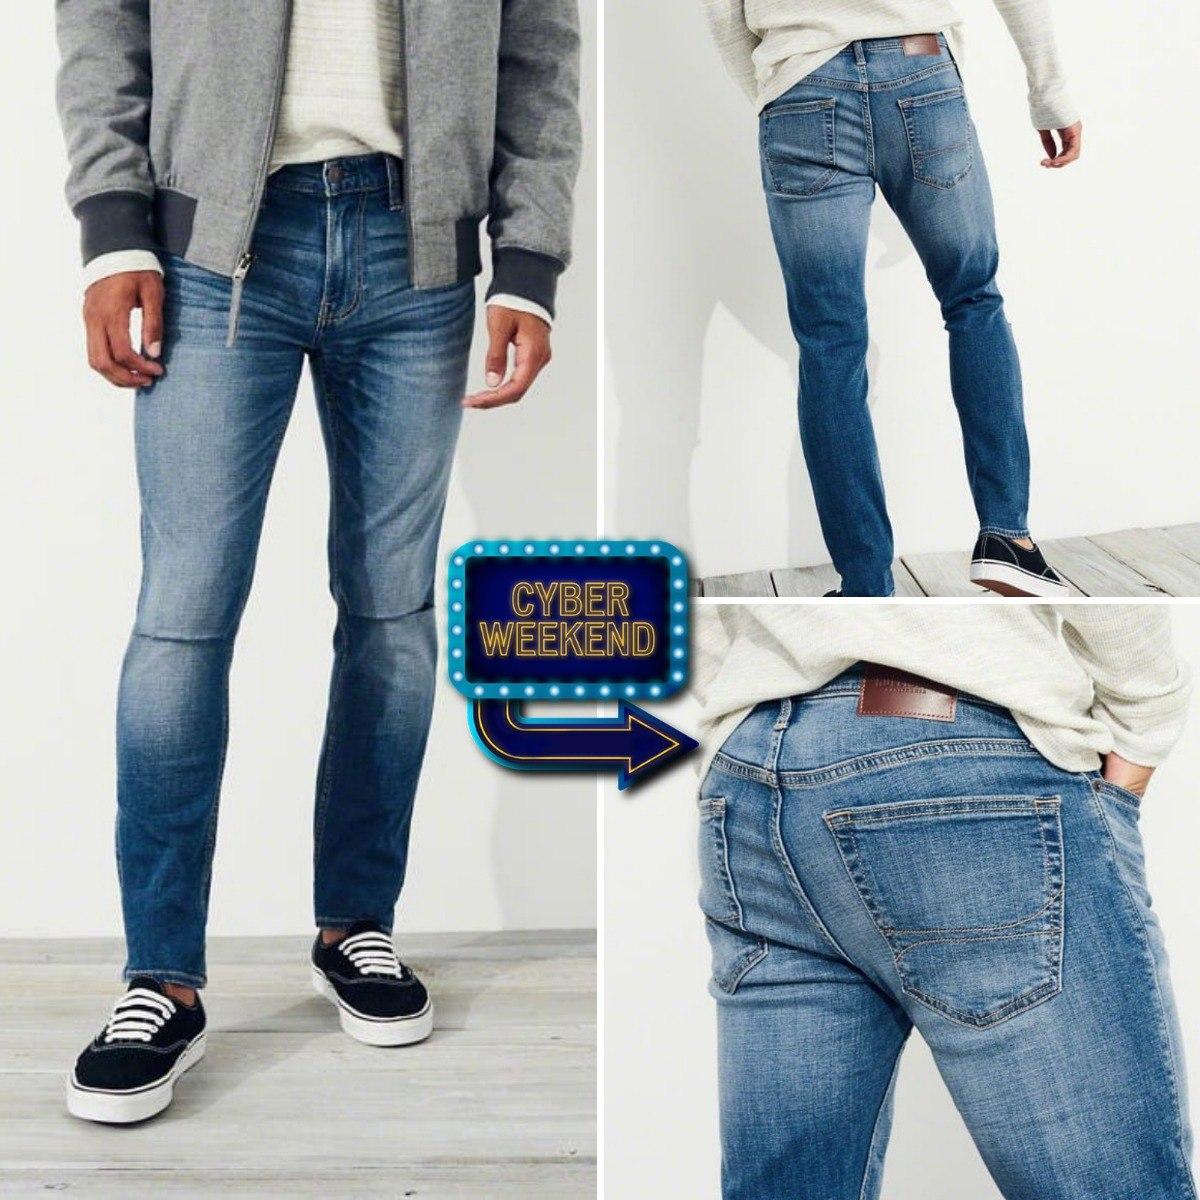 4955af17ec pantalón jeans super skinny hollister talla 32 x 32 rasgado. Cargando zoom.